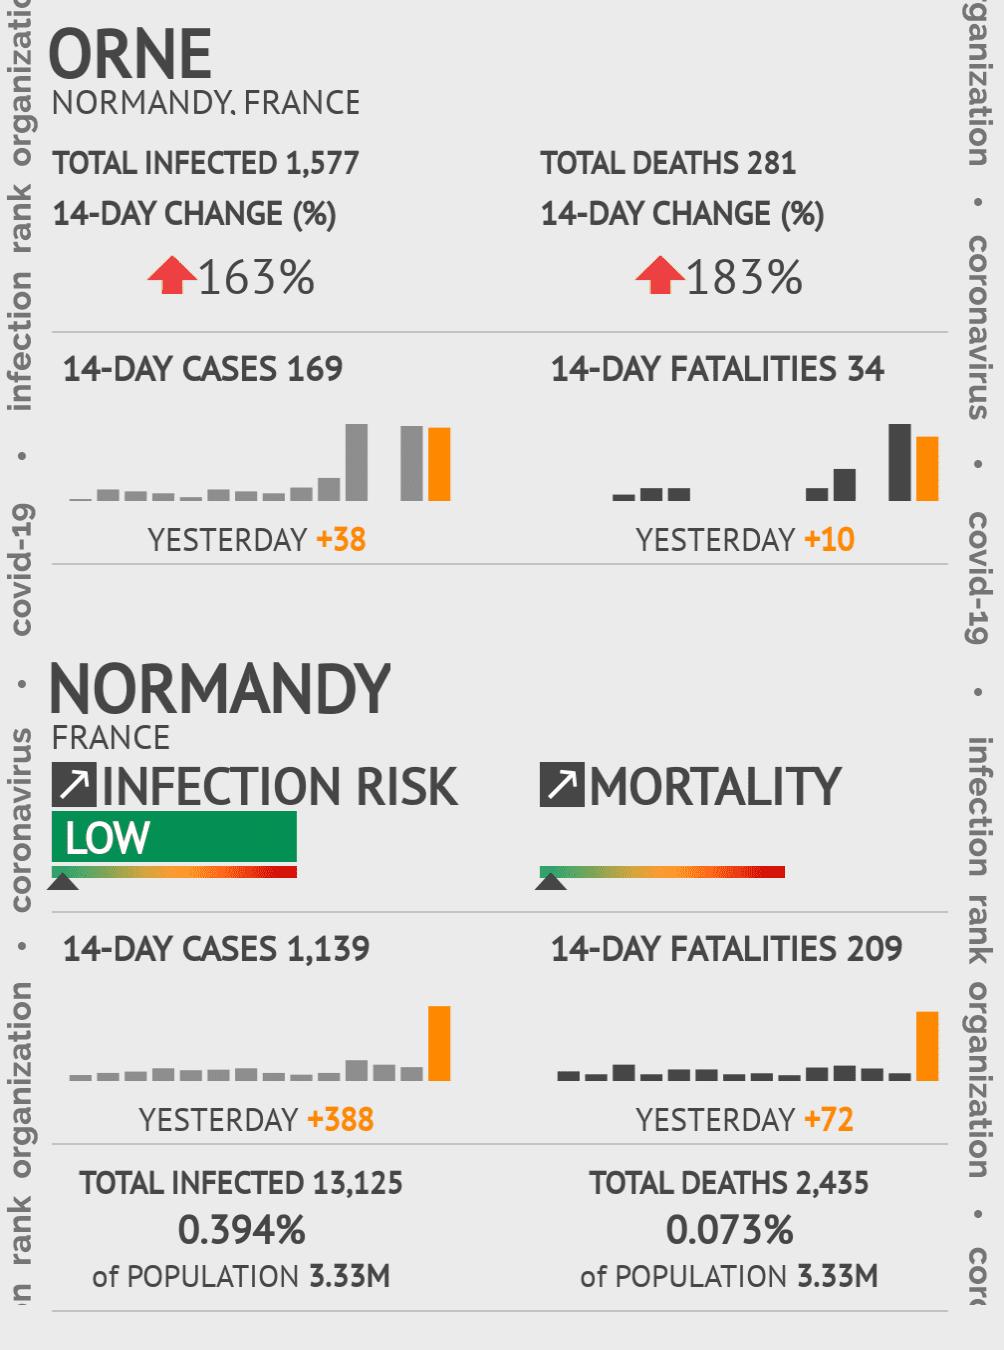 Orne Coronavirus Covid-19 Risk of Infection on February 25, 2021